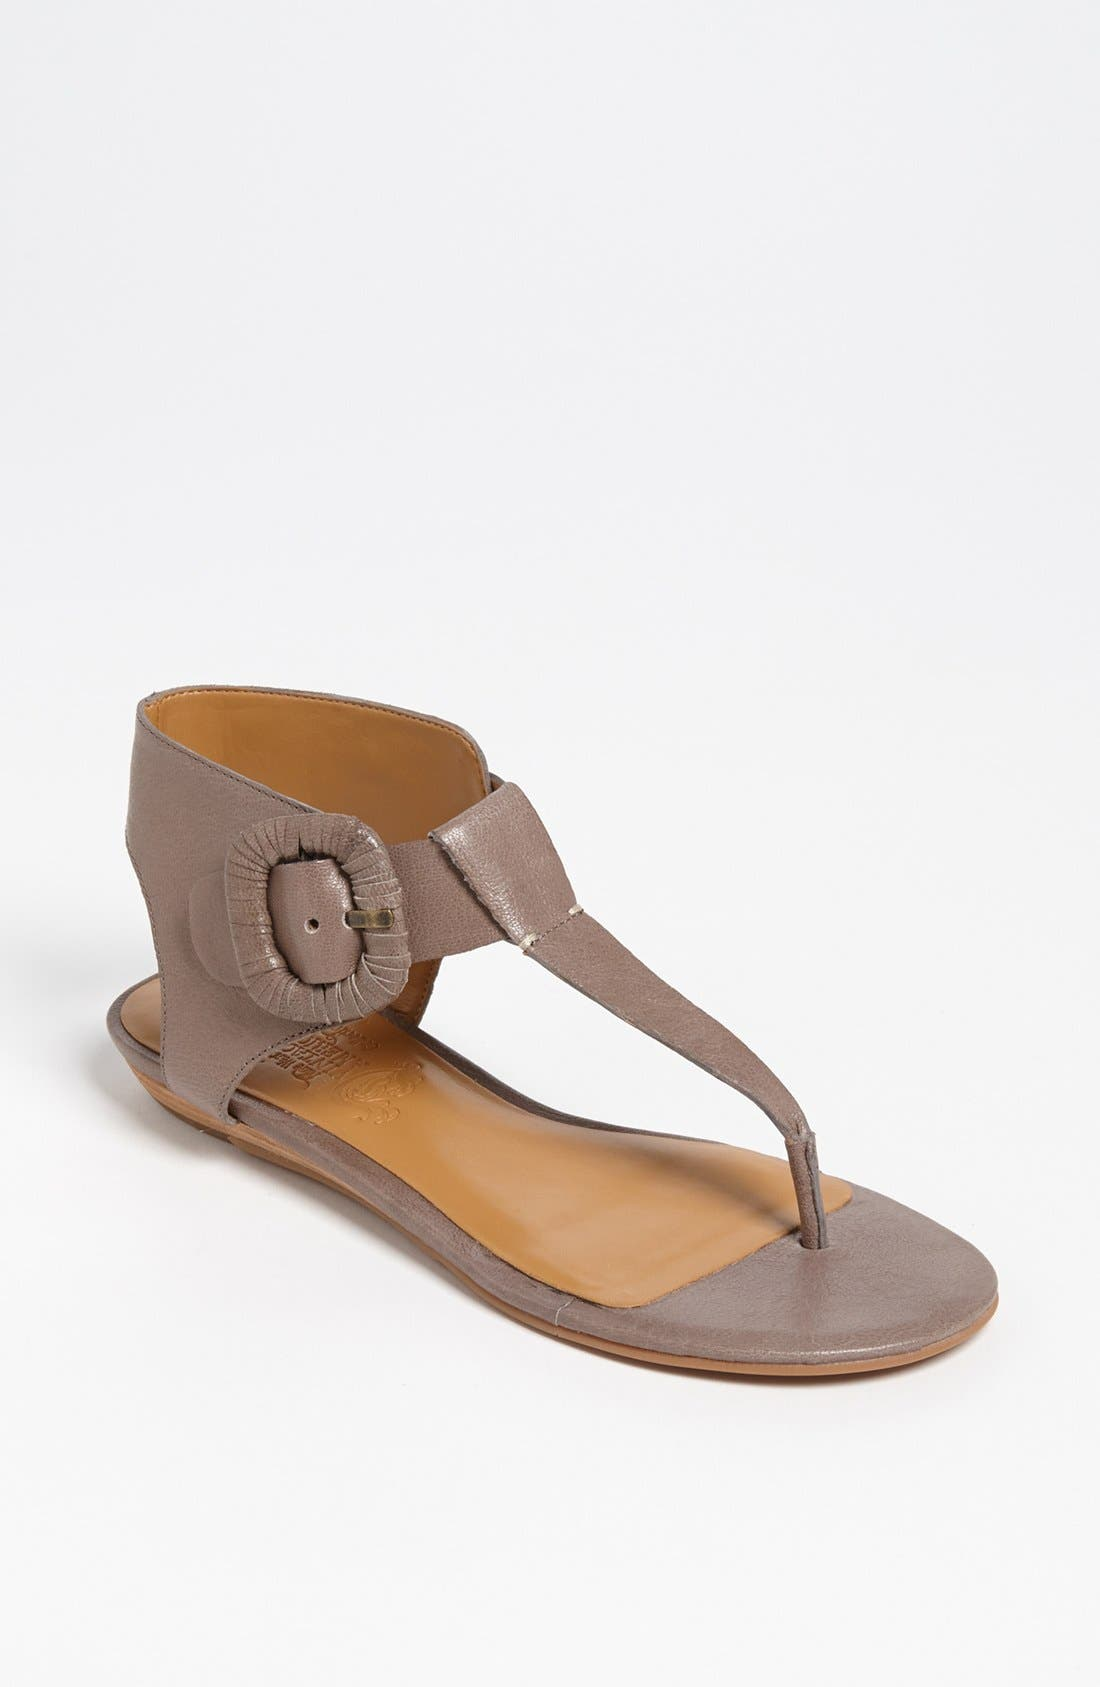 Alternate Image 1 Selected - Nine West 'Wiloh' Sandal